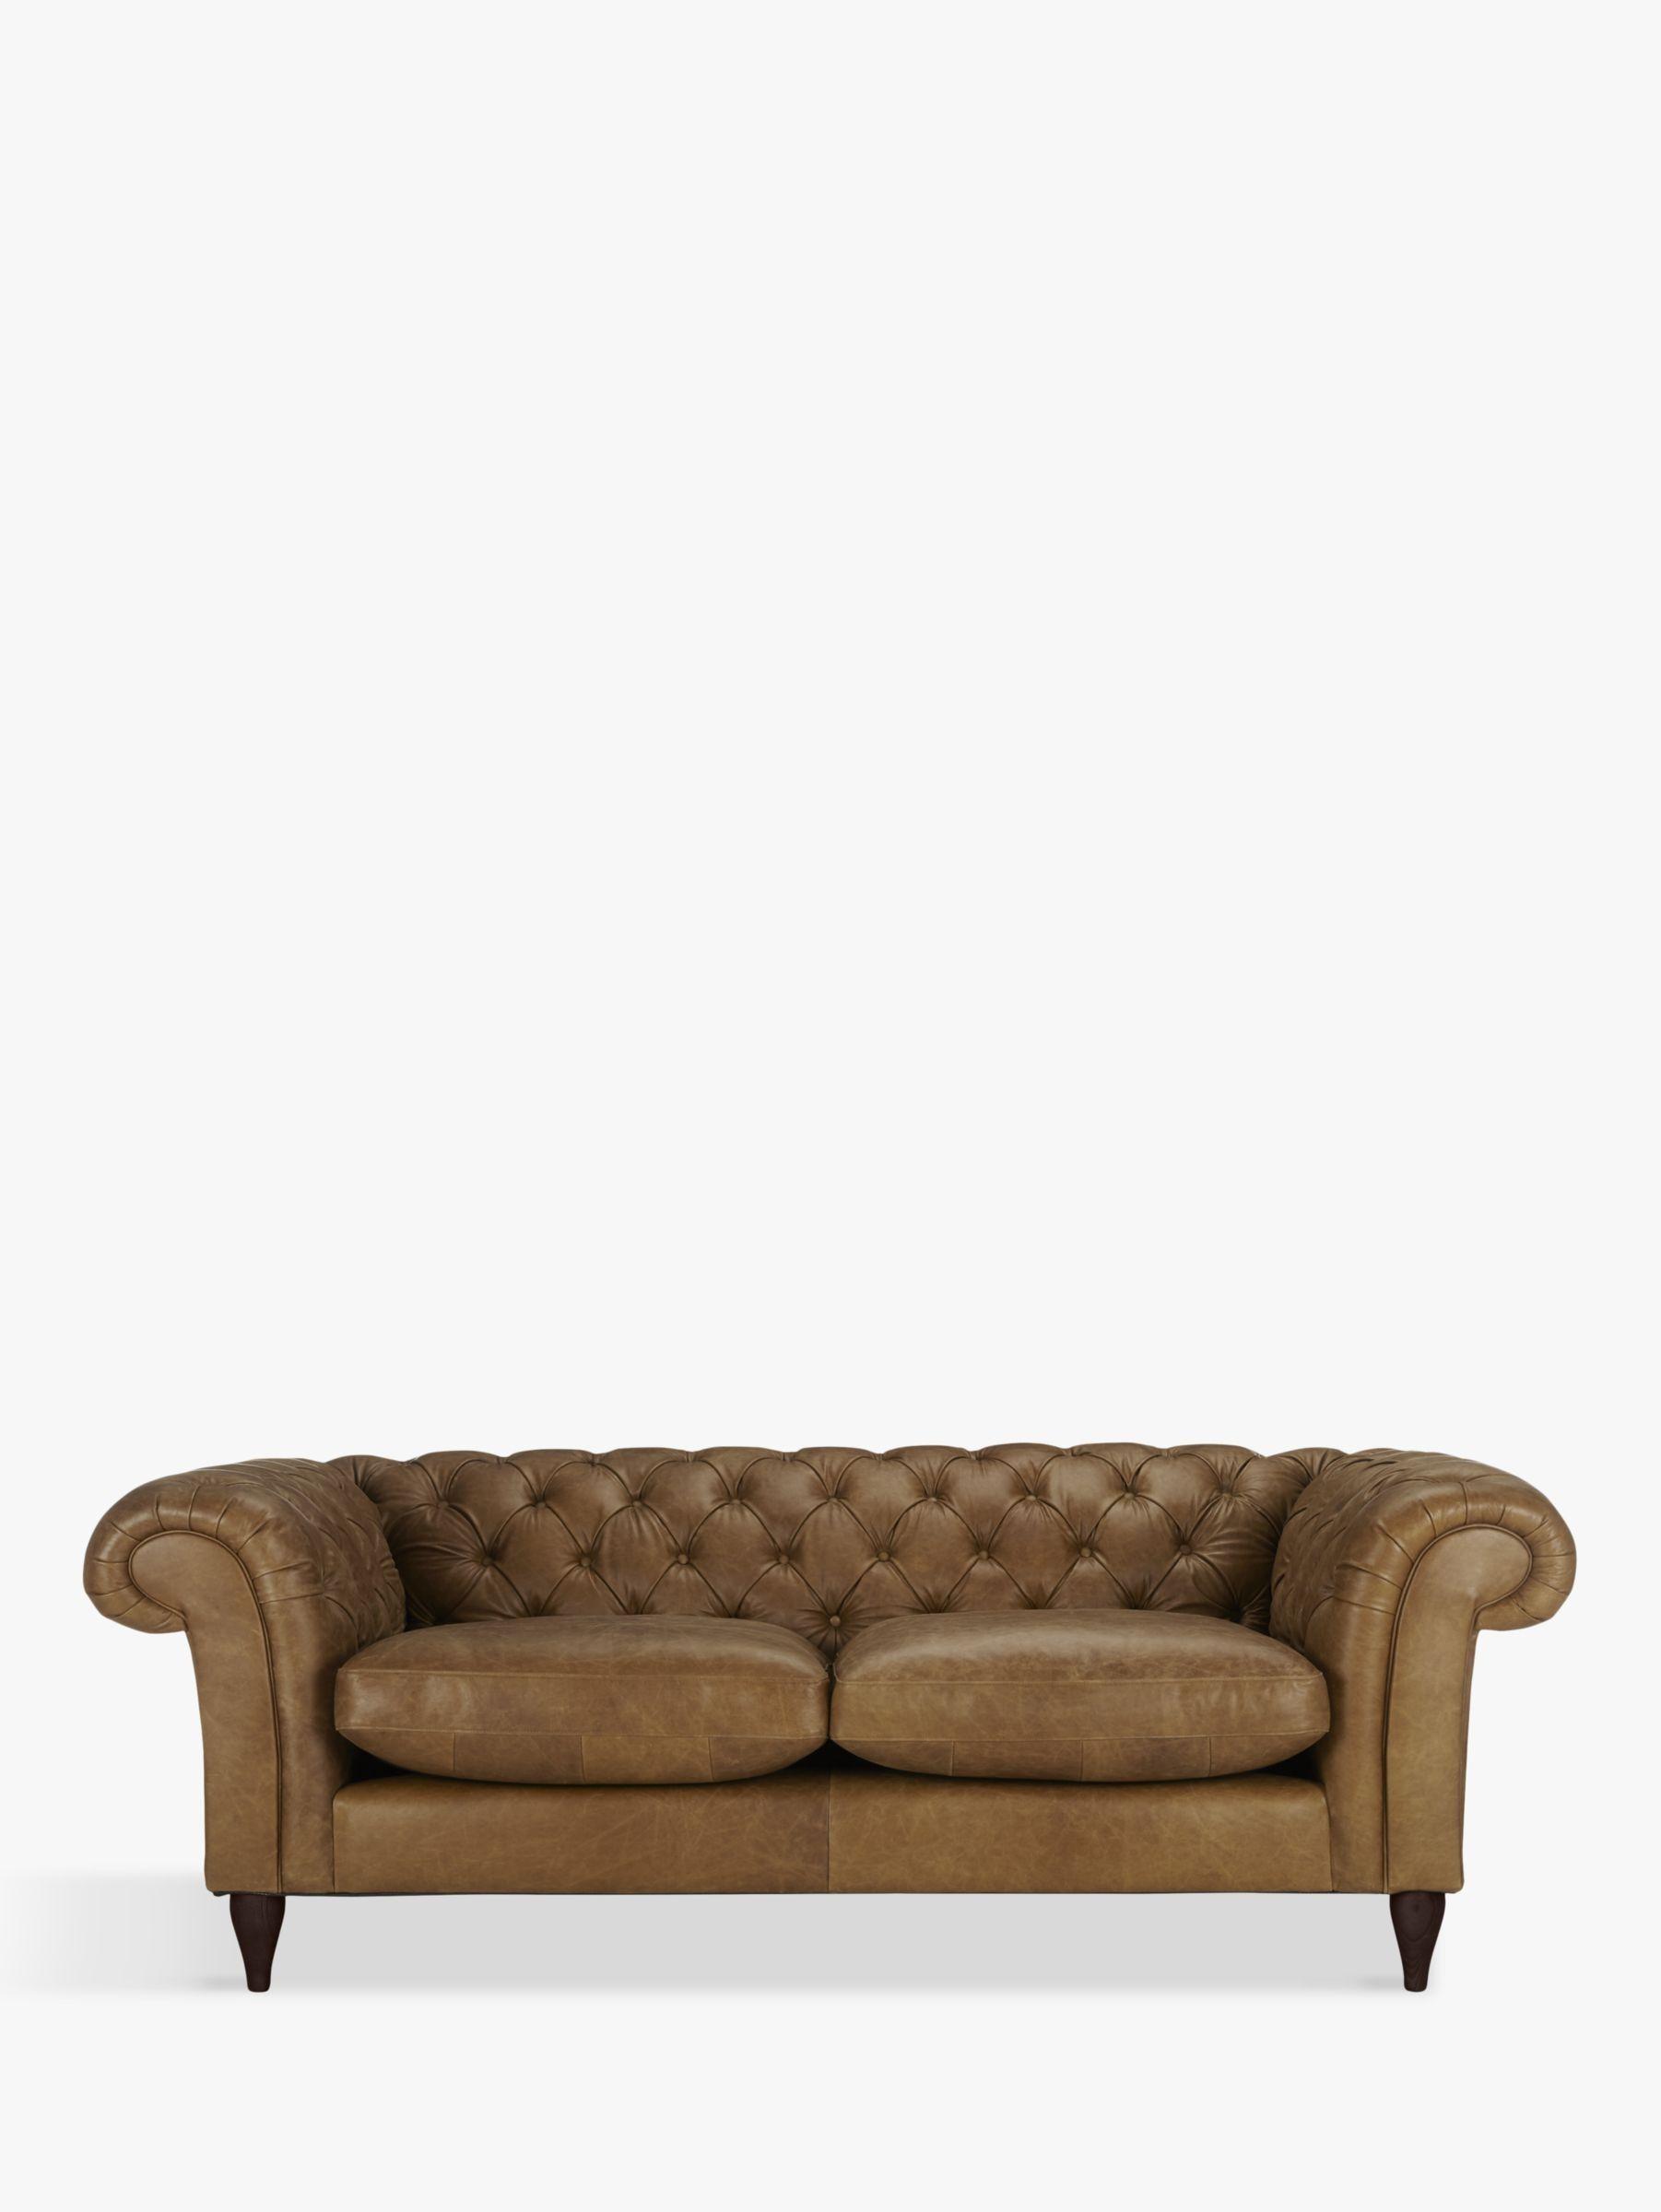 John Lewis Partners Cromwell Chesterfield Grand 4 Seater Leather Sofa Dark Leg Contempo Dark Chocolate Sofa Large Sofa Leather Sofa